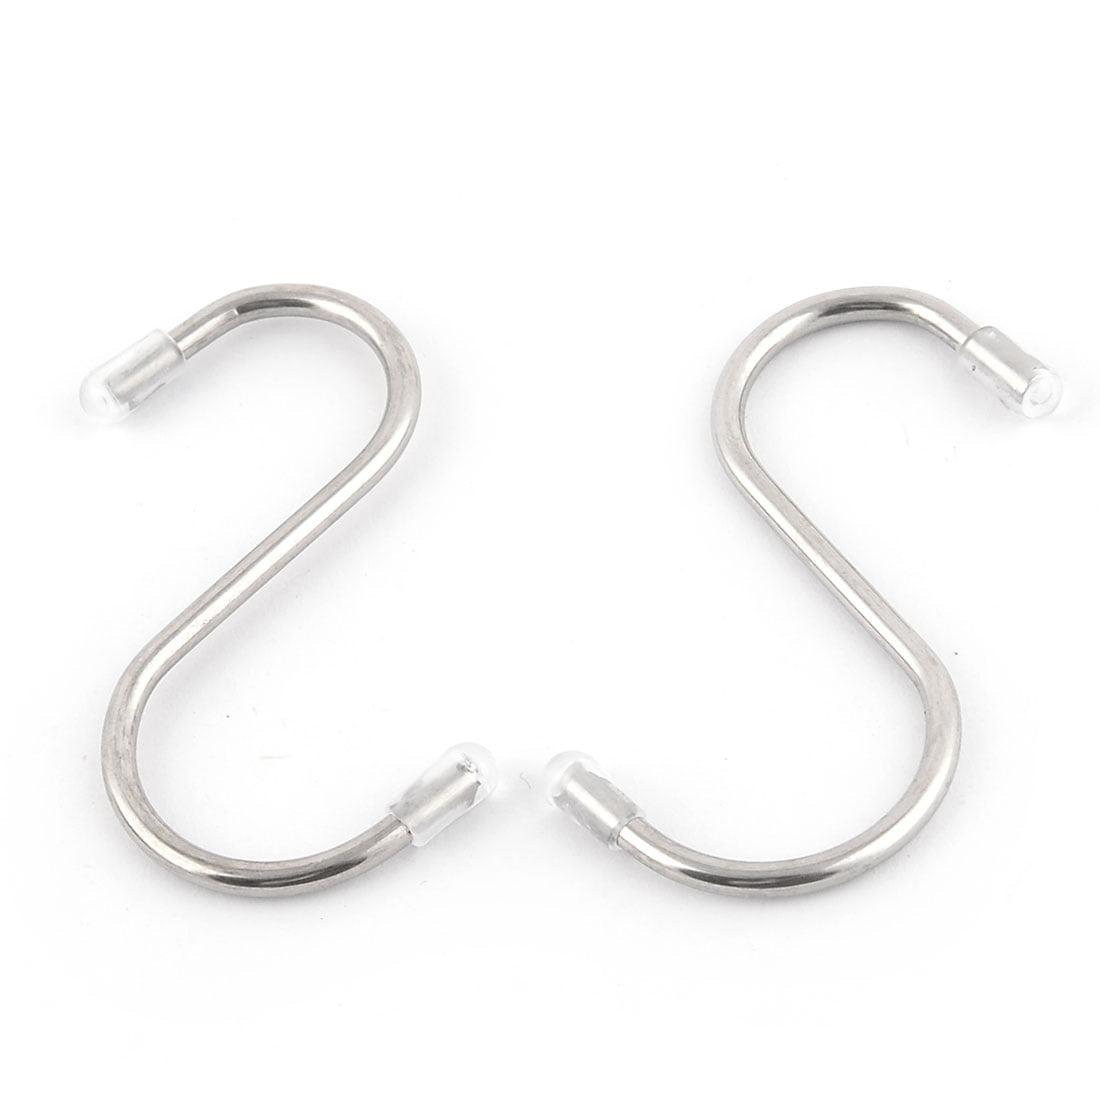 Dorm Room Stainless Steel S Shaped Coats Holder Hanger Hook 5.5cm Width 25pcs - image 3 of 4